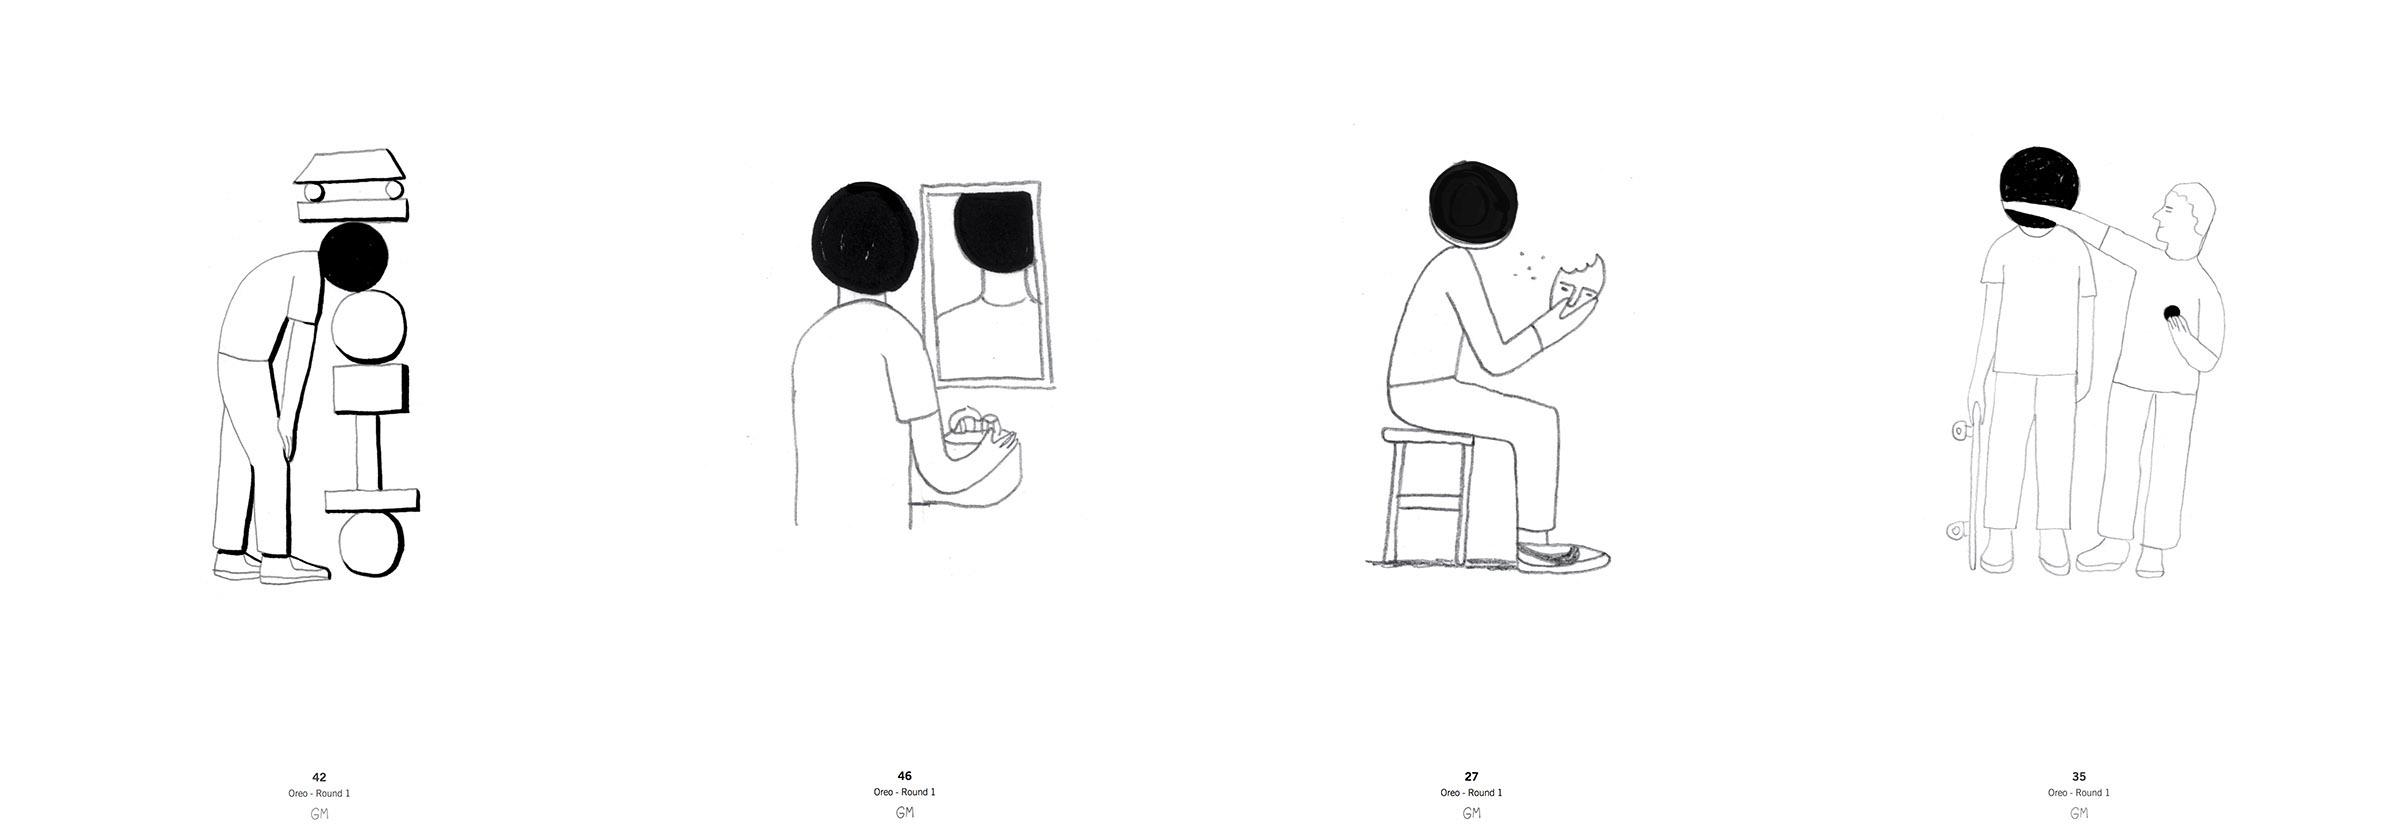 Geoff McFetridge concept sketches 2